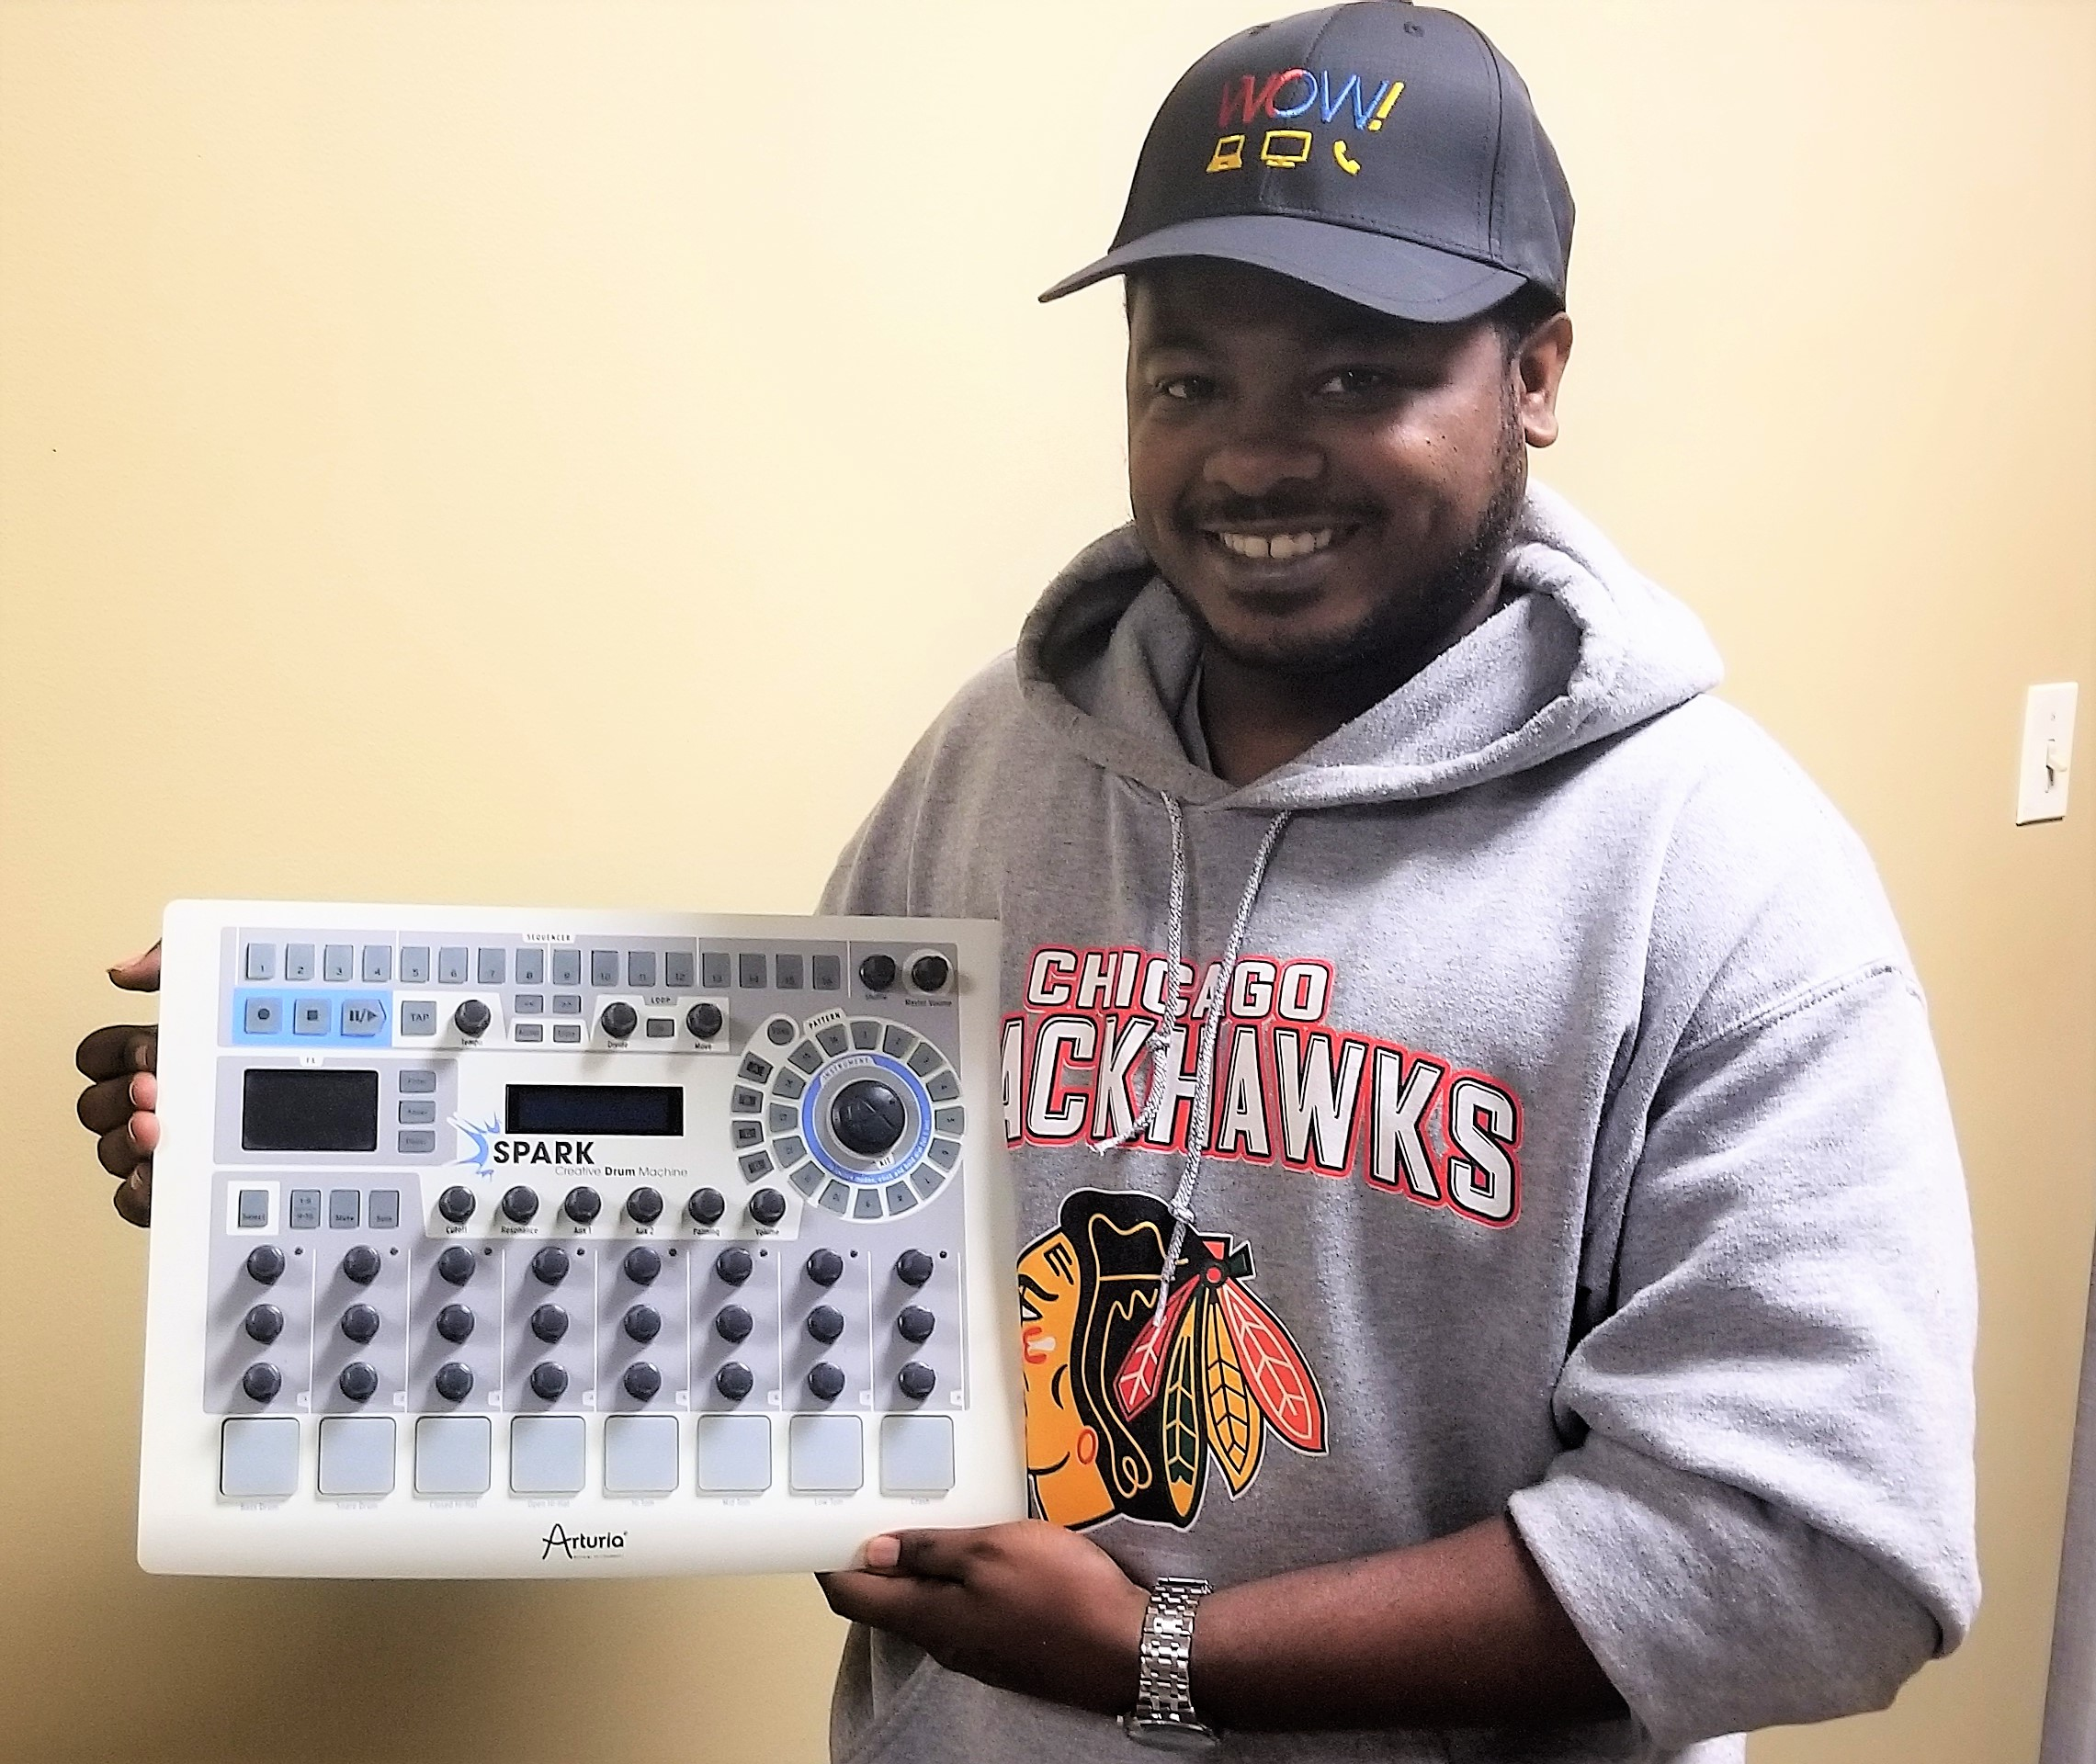 Kottrell Johnson holding the Arturia Creative Drum Machine